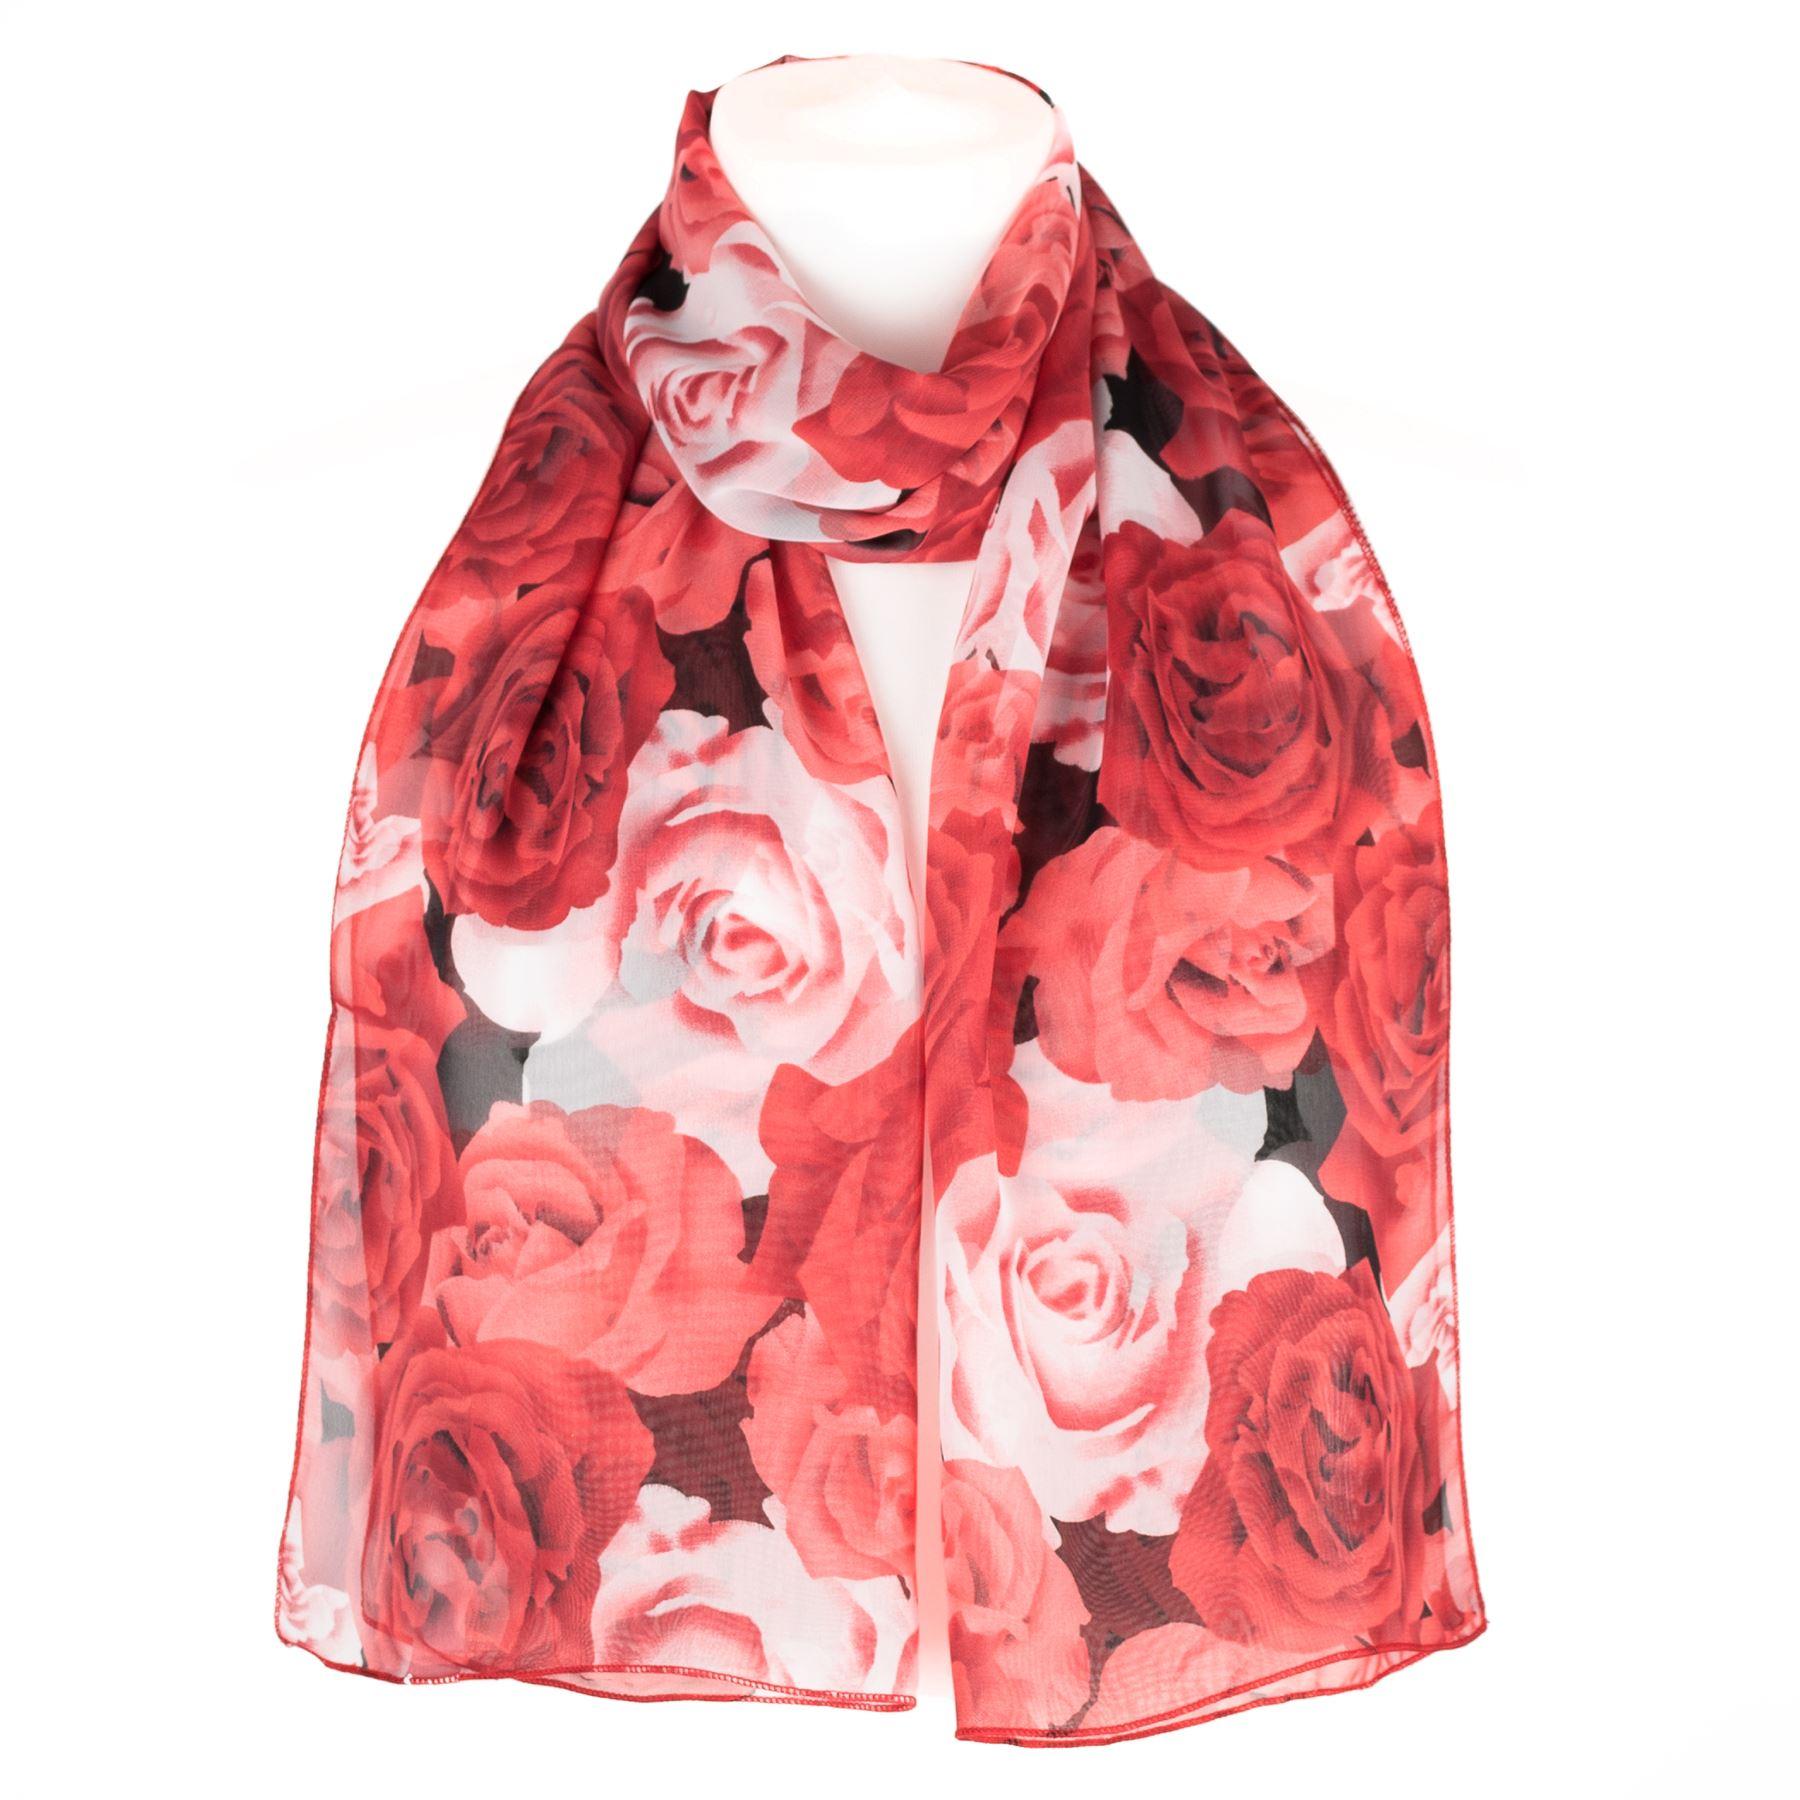 Filles-Femmes-echarpe-en-mousseline-foulard-imprime-rose-chale-enveloppant